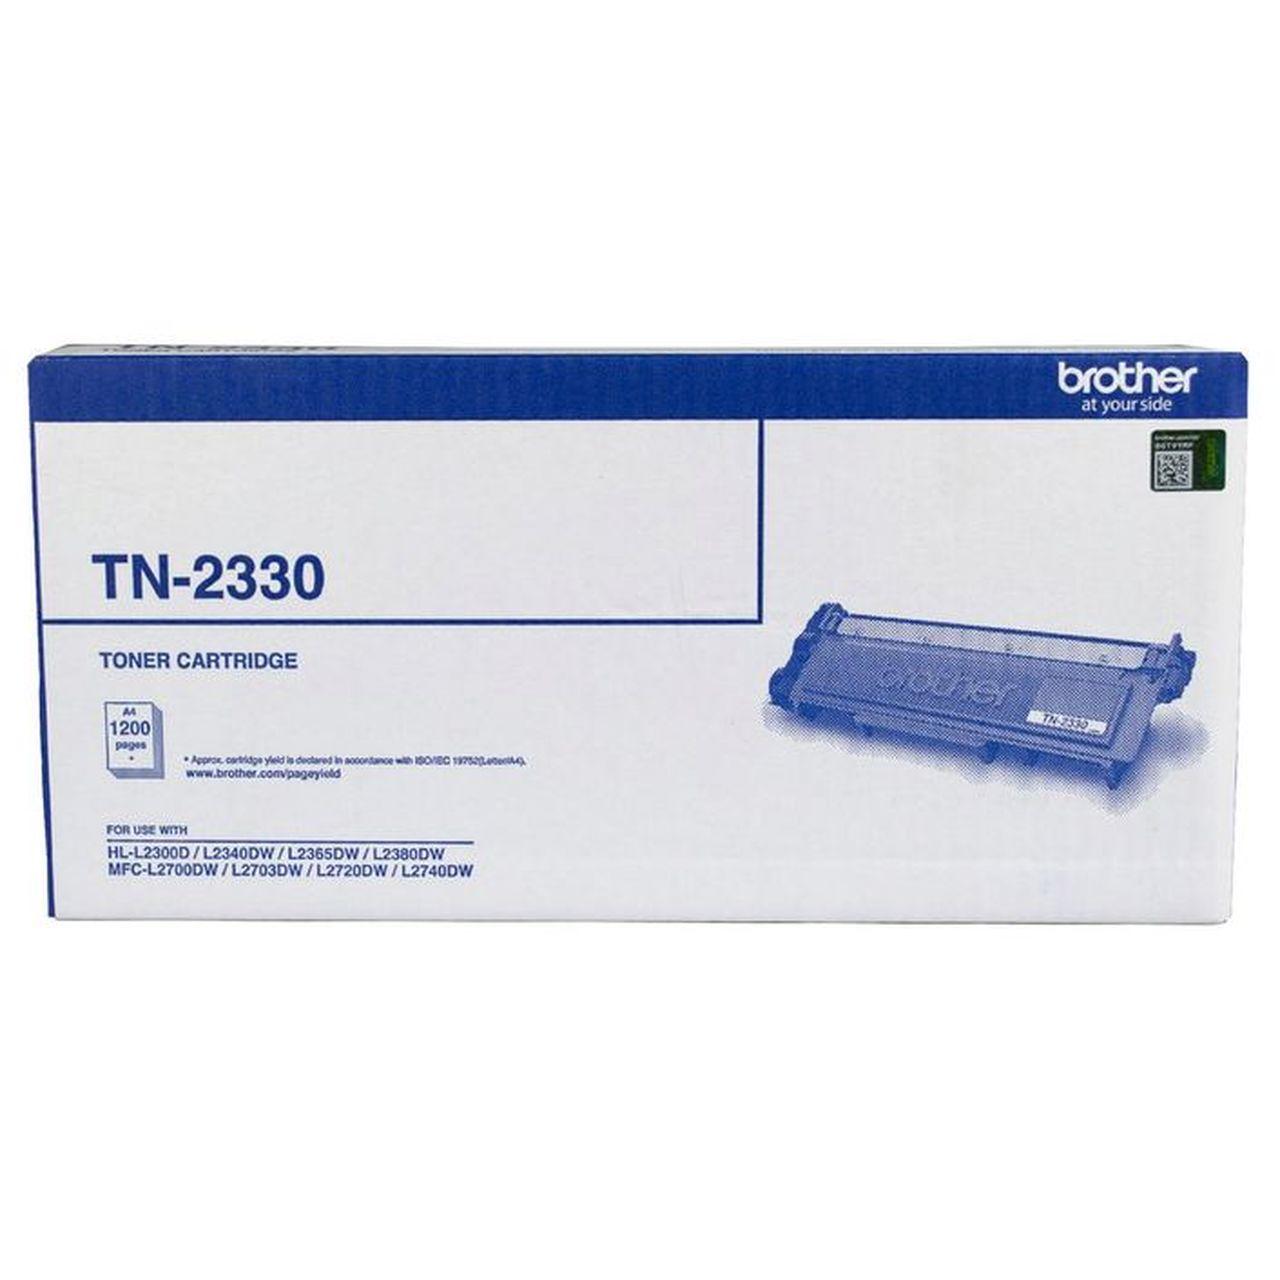 Brother TN-2230 Mono Laser Toner - Standard, HL-2240D/2242D/2250DN/2270DW, DCP-7060D/7065DN, MFC-7360N/7362N/7460DN/7860DW/7240, FAX-2950/2840